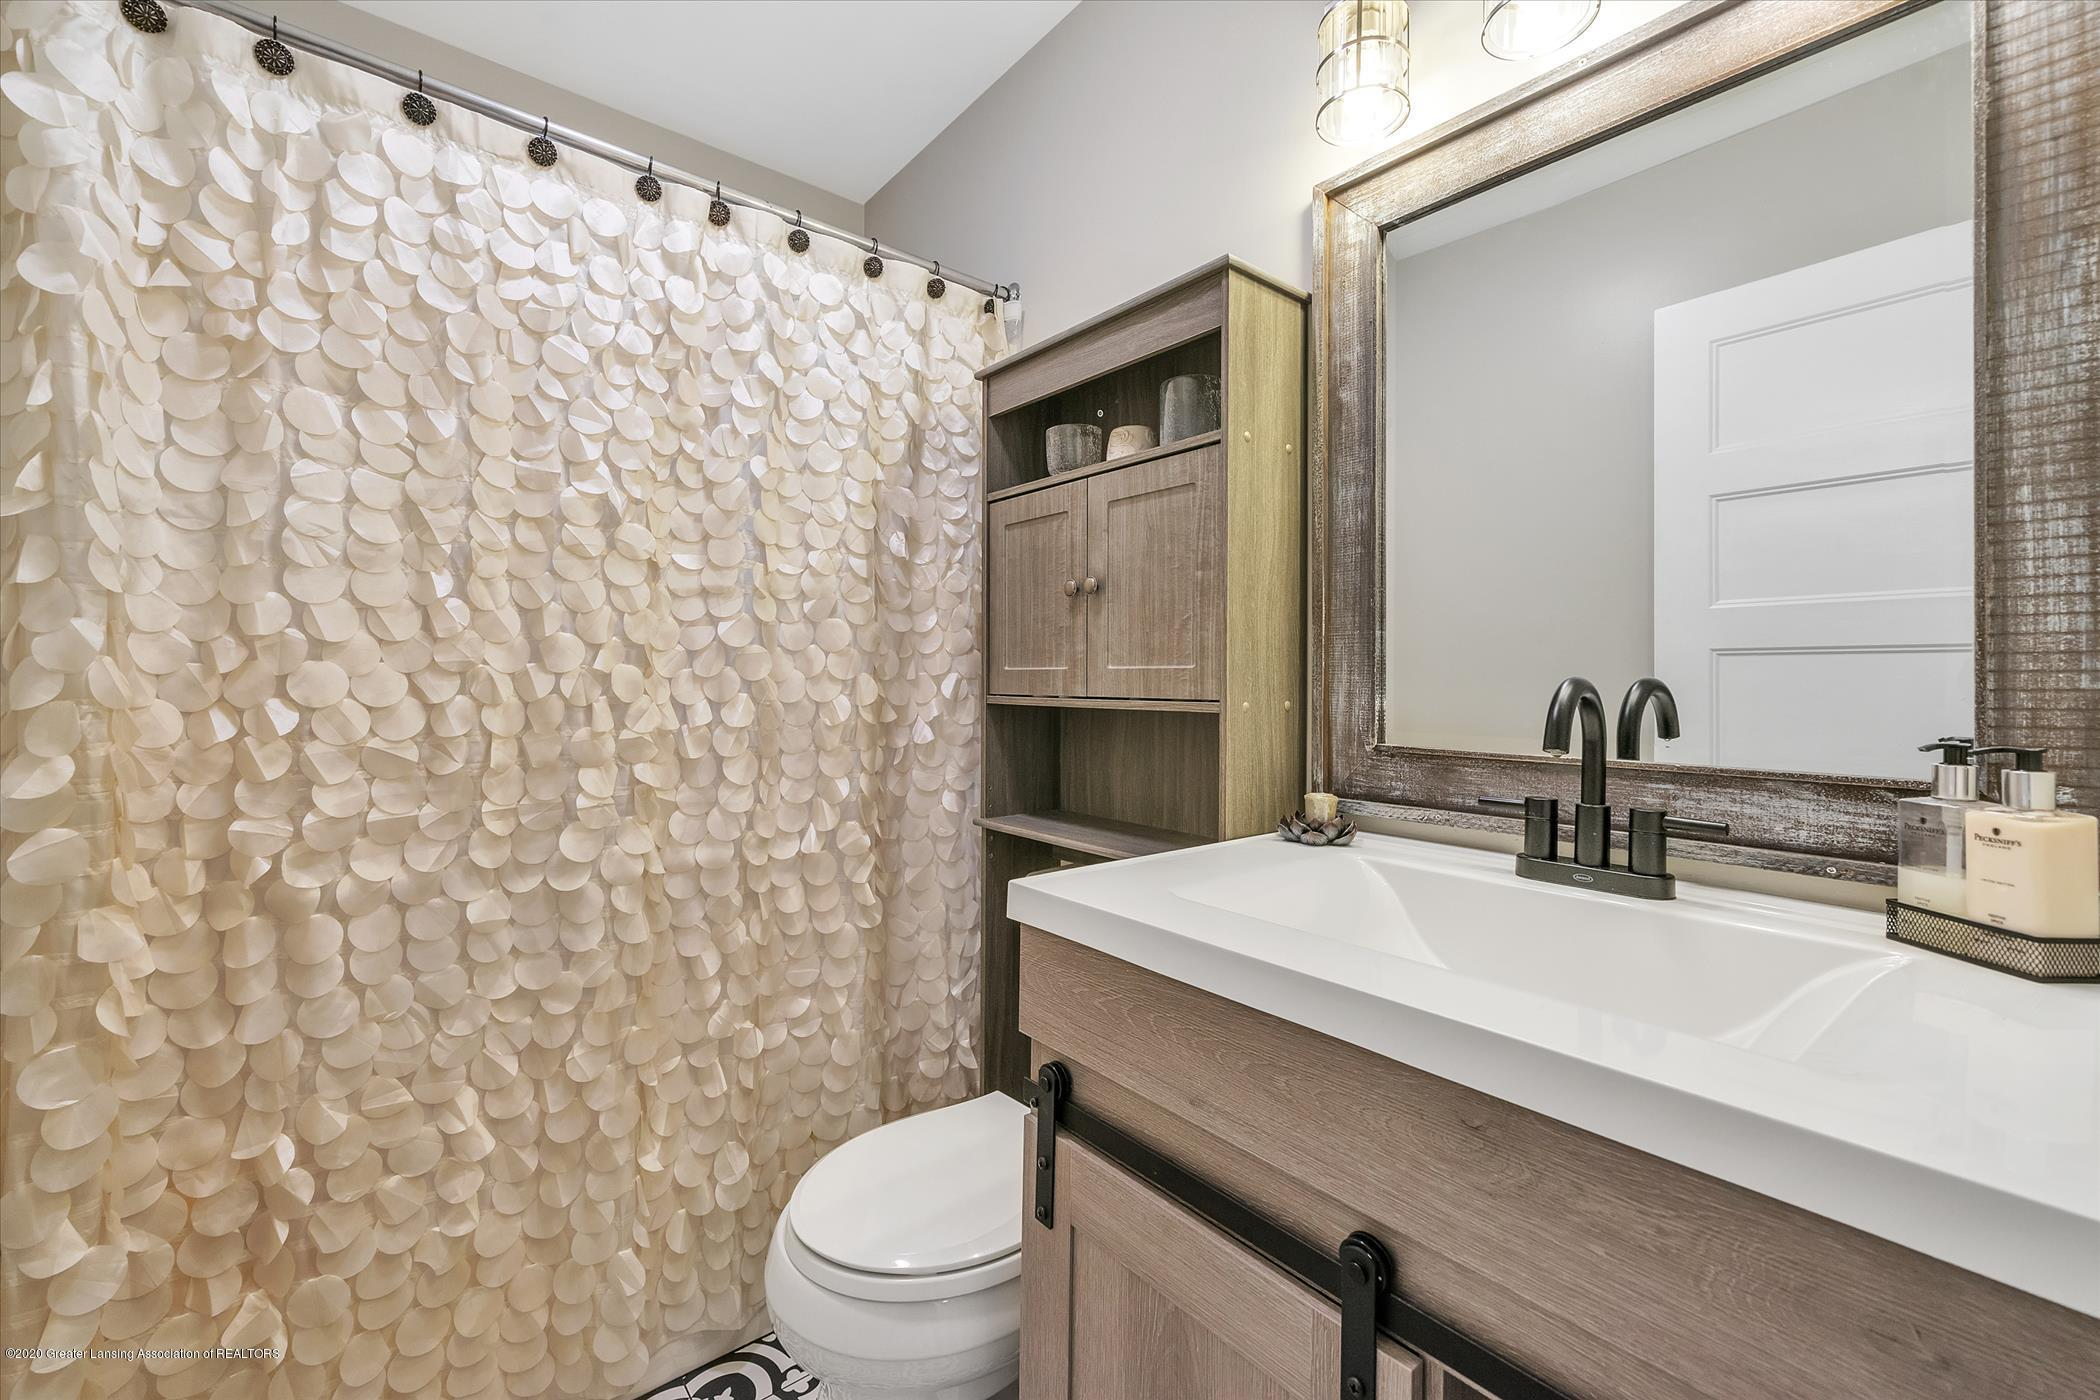 3087 Sandhill Rd - Bathroom view 1 - 13